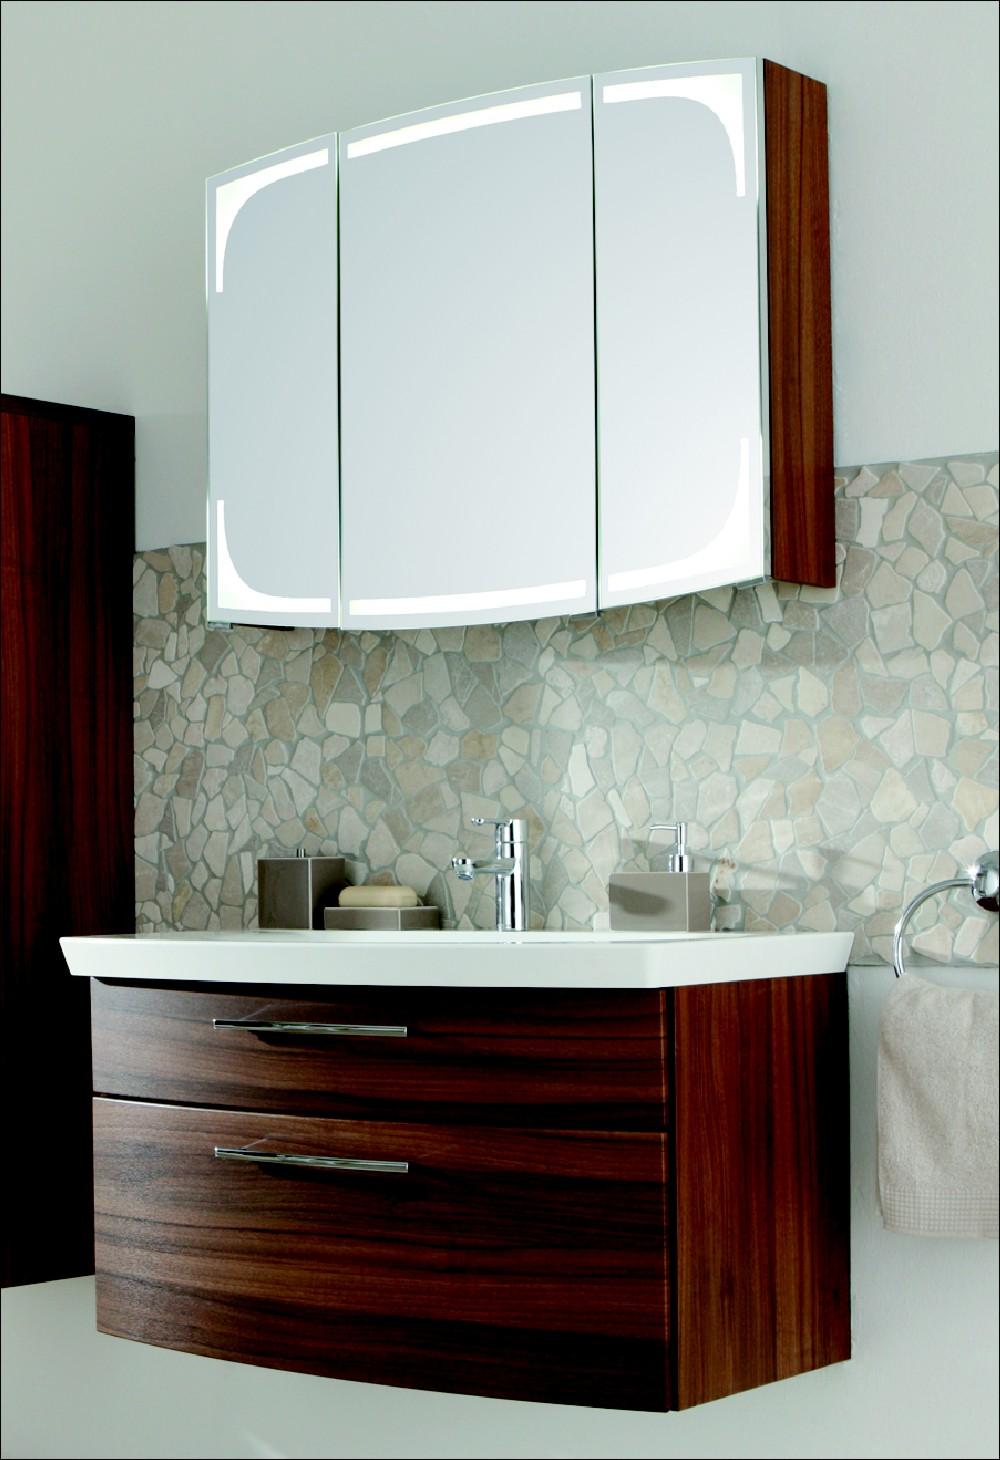 unterschrank classic line badschrank g nstig arcom center. Black Bedroom Furniture Sets. Home Design Ideas